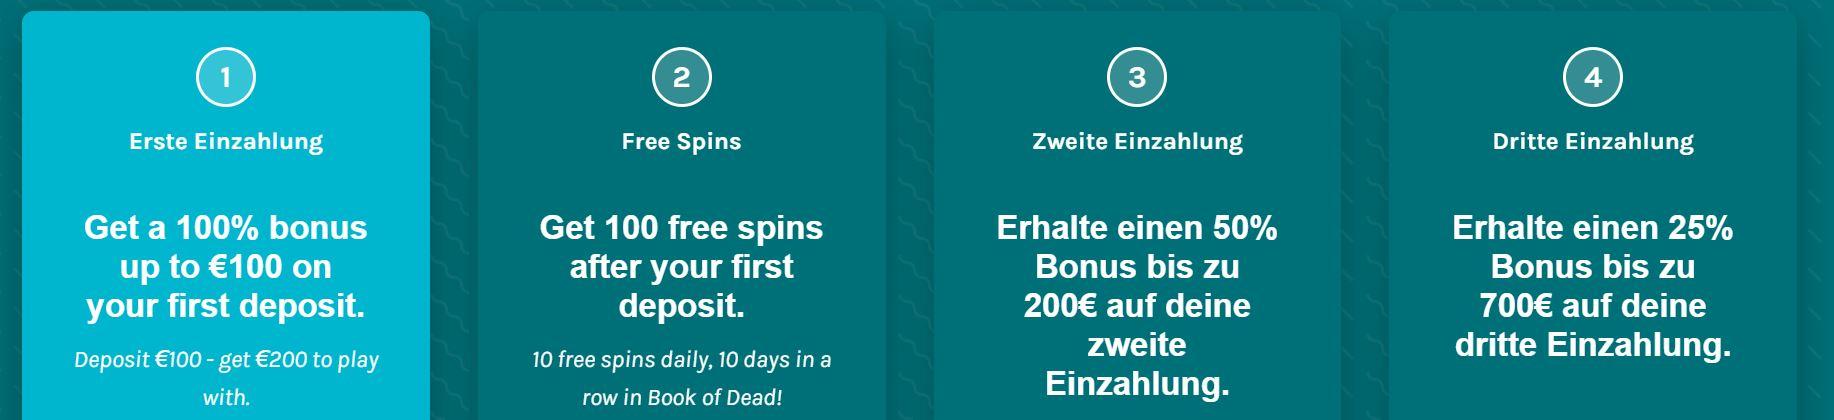 Lucky days €1000 bonus + 100 spins